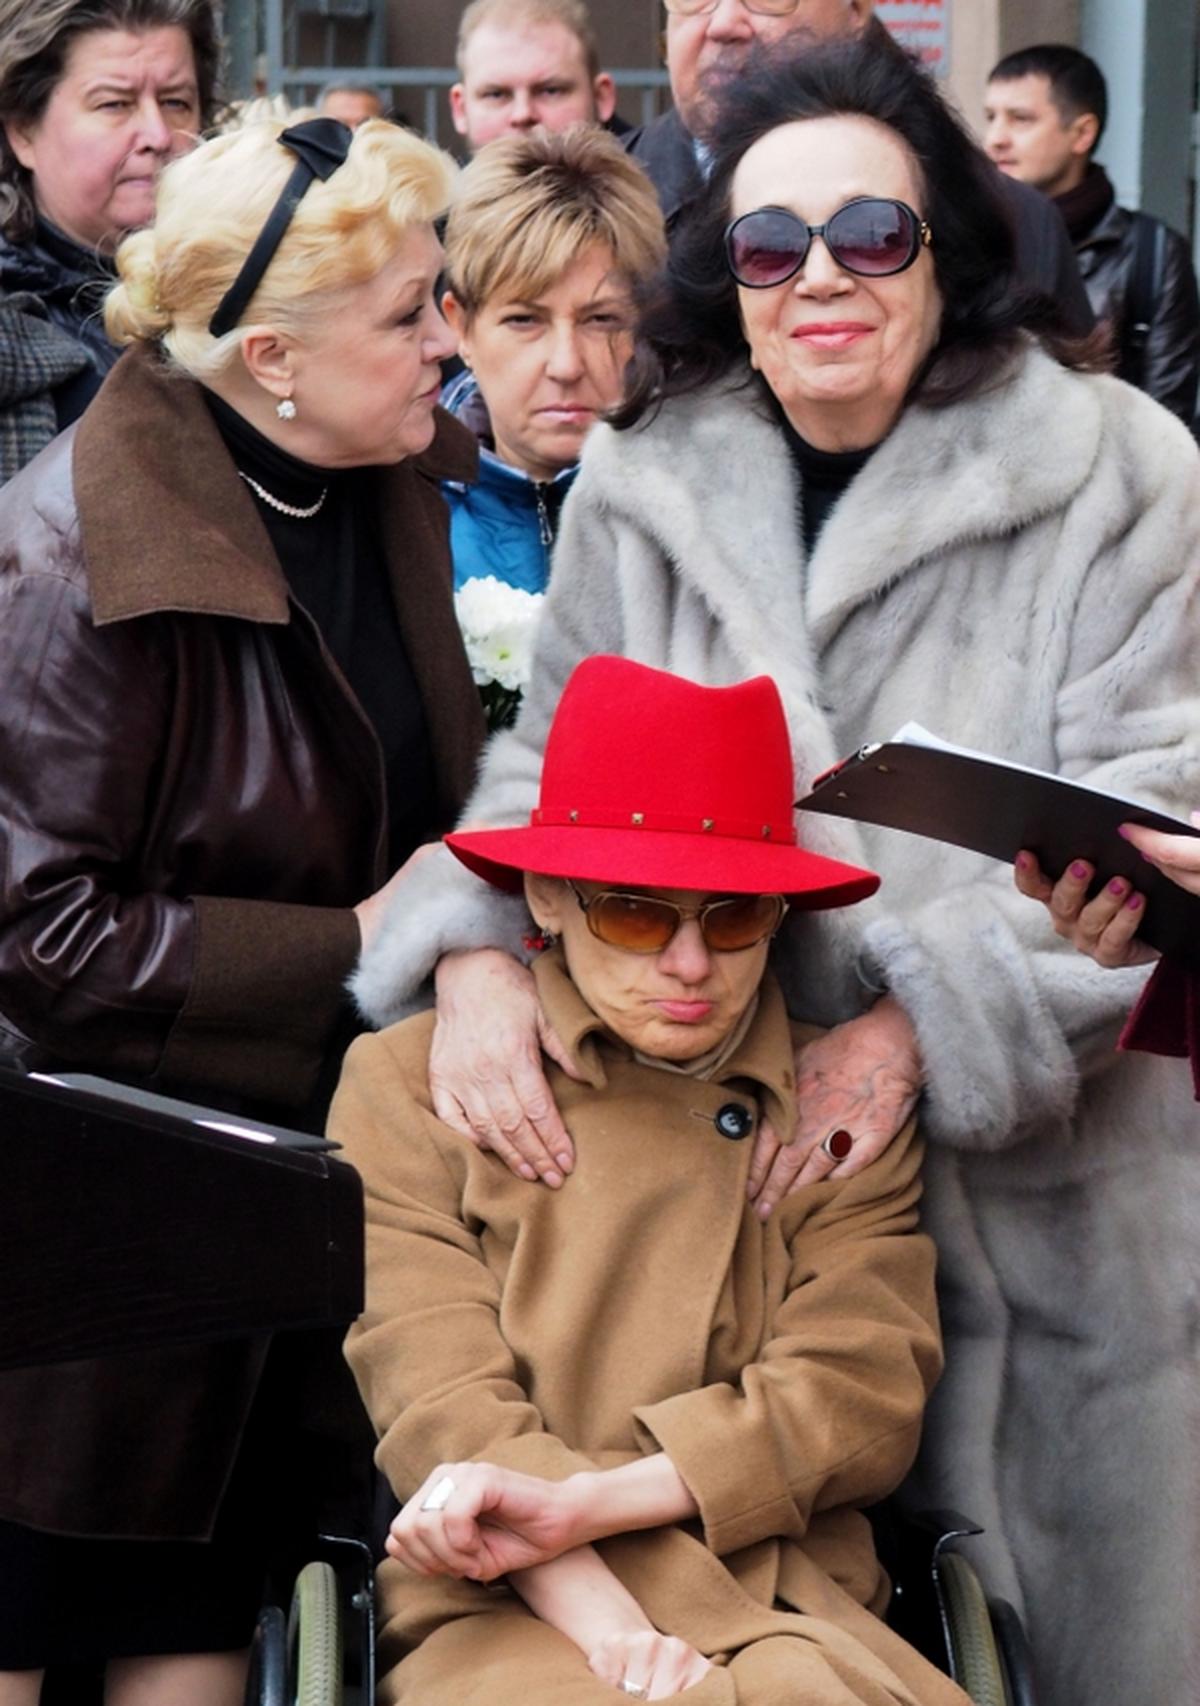 Наталья Дрожжина, Гитана Леонтенко, Мария Баталова